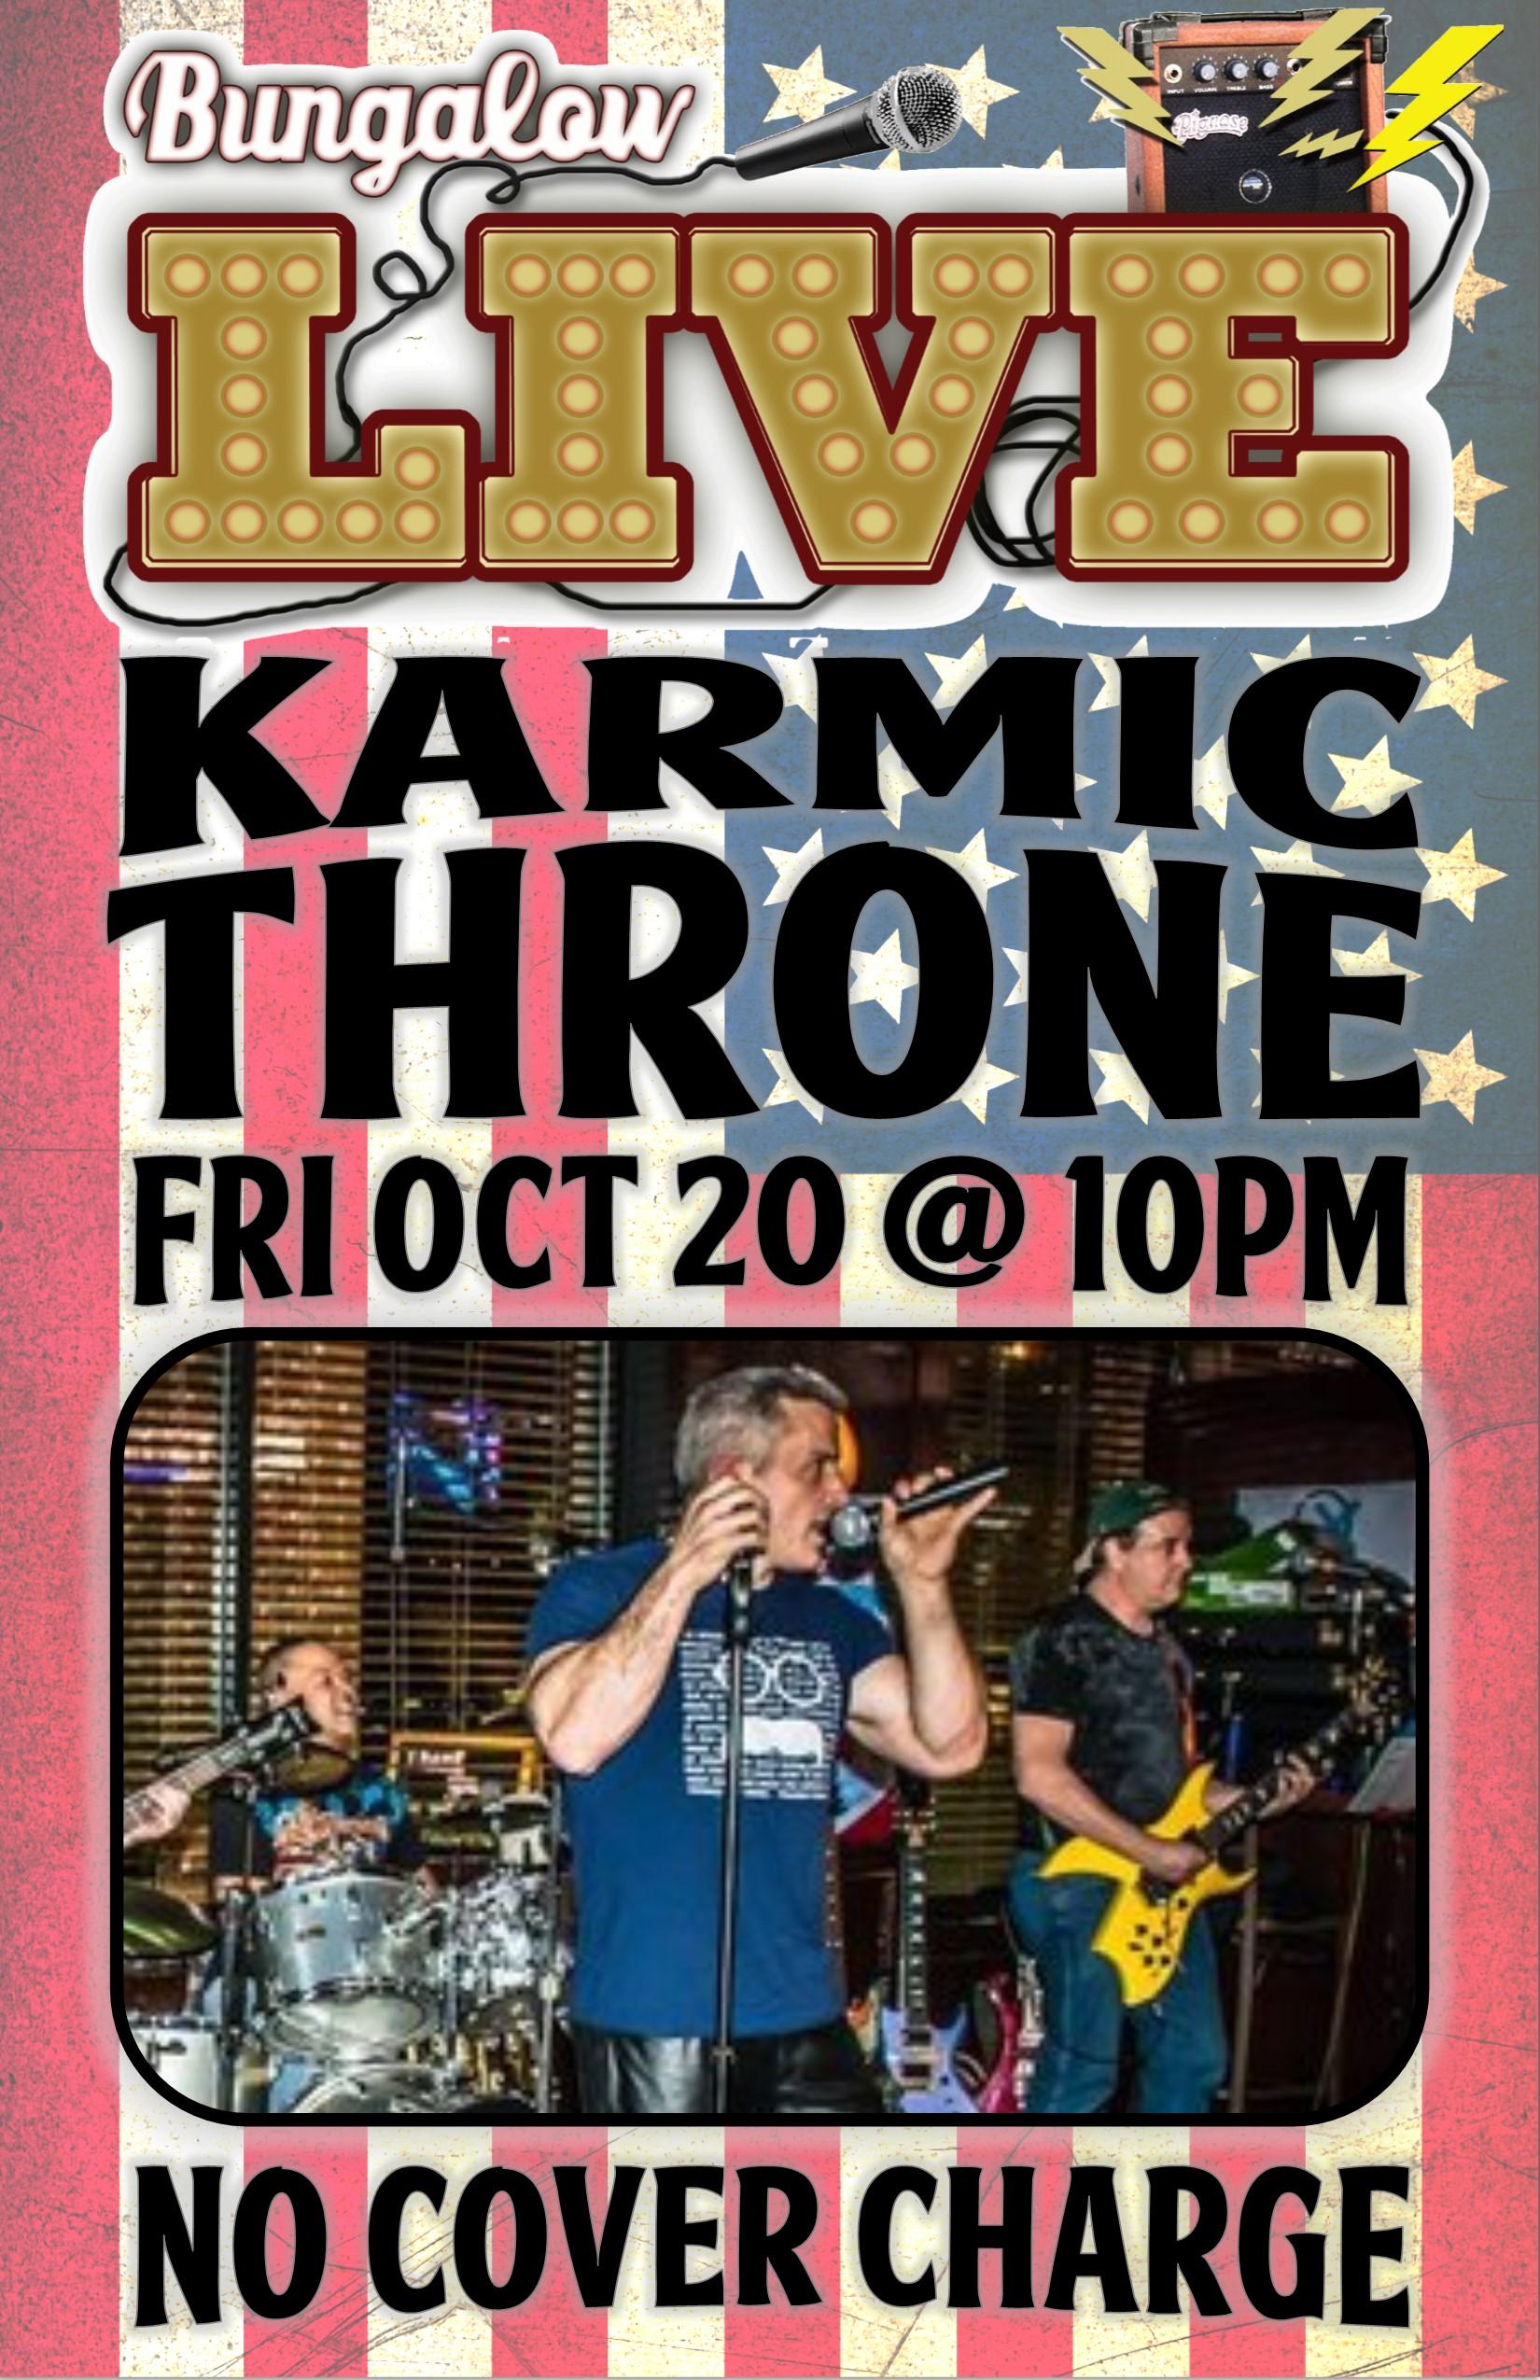 Karmic Throne Oct 2017